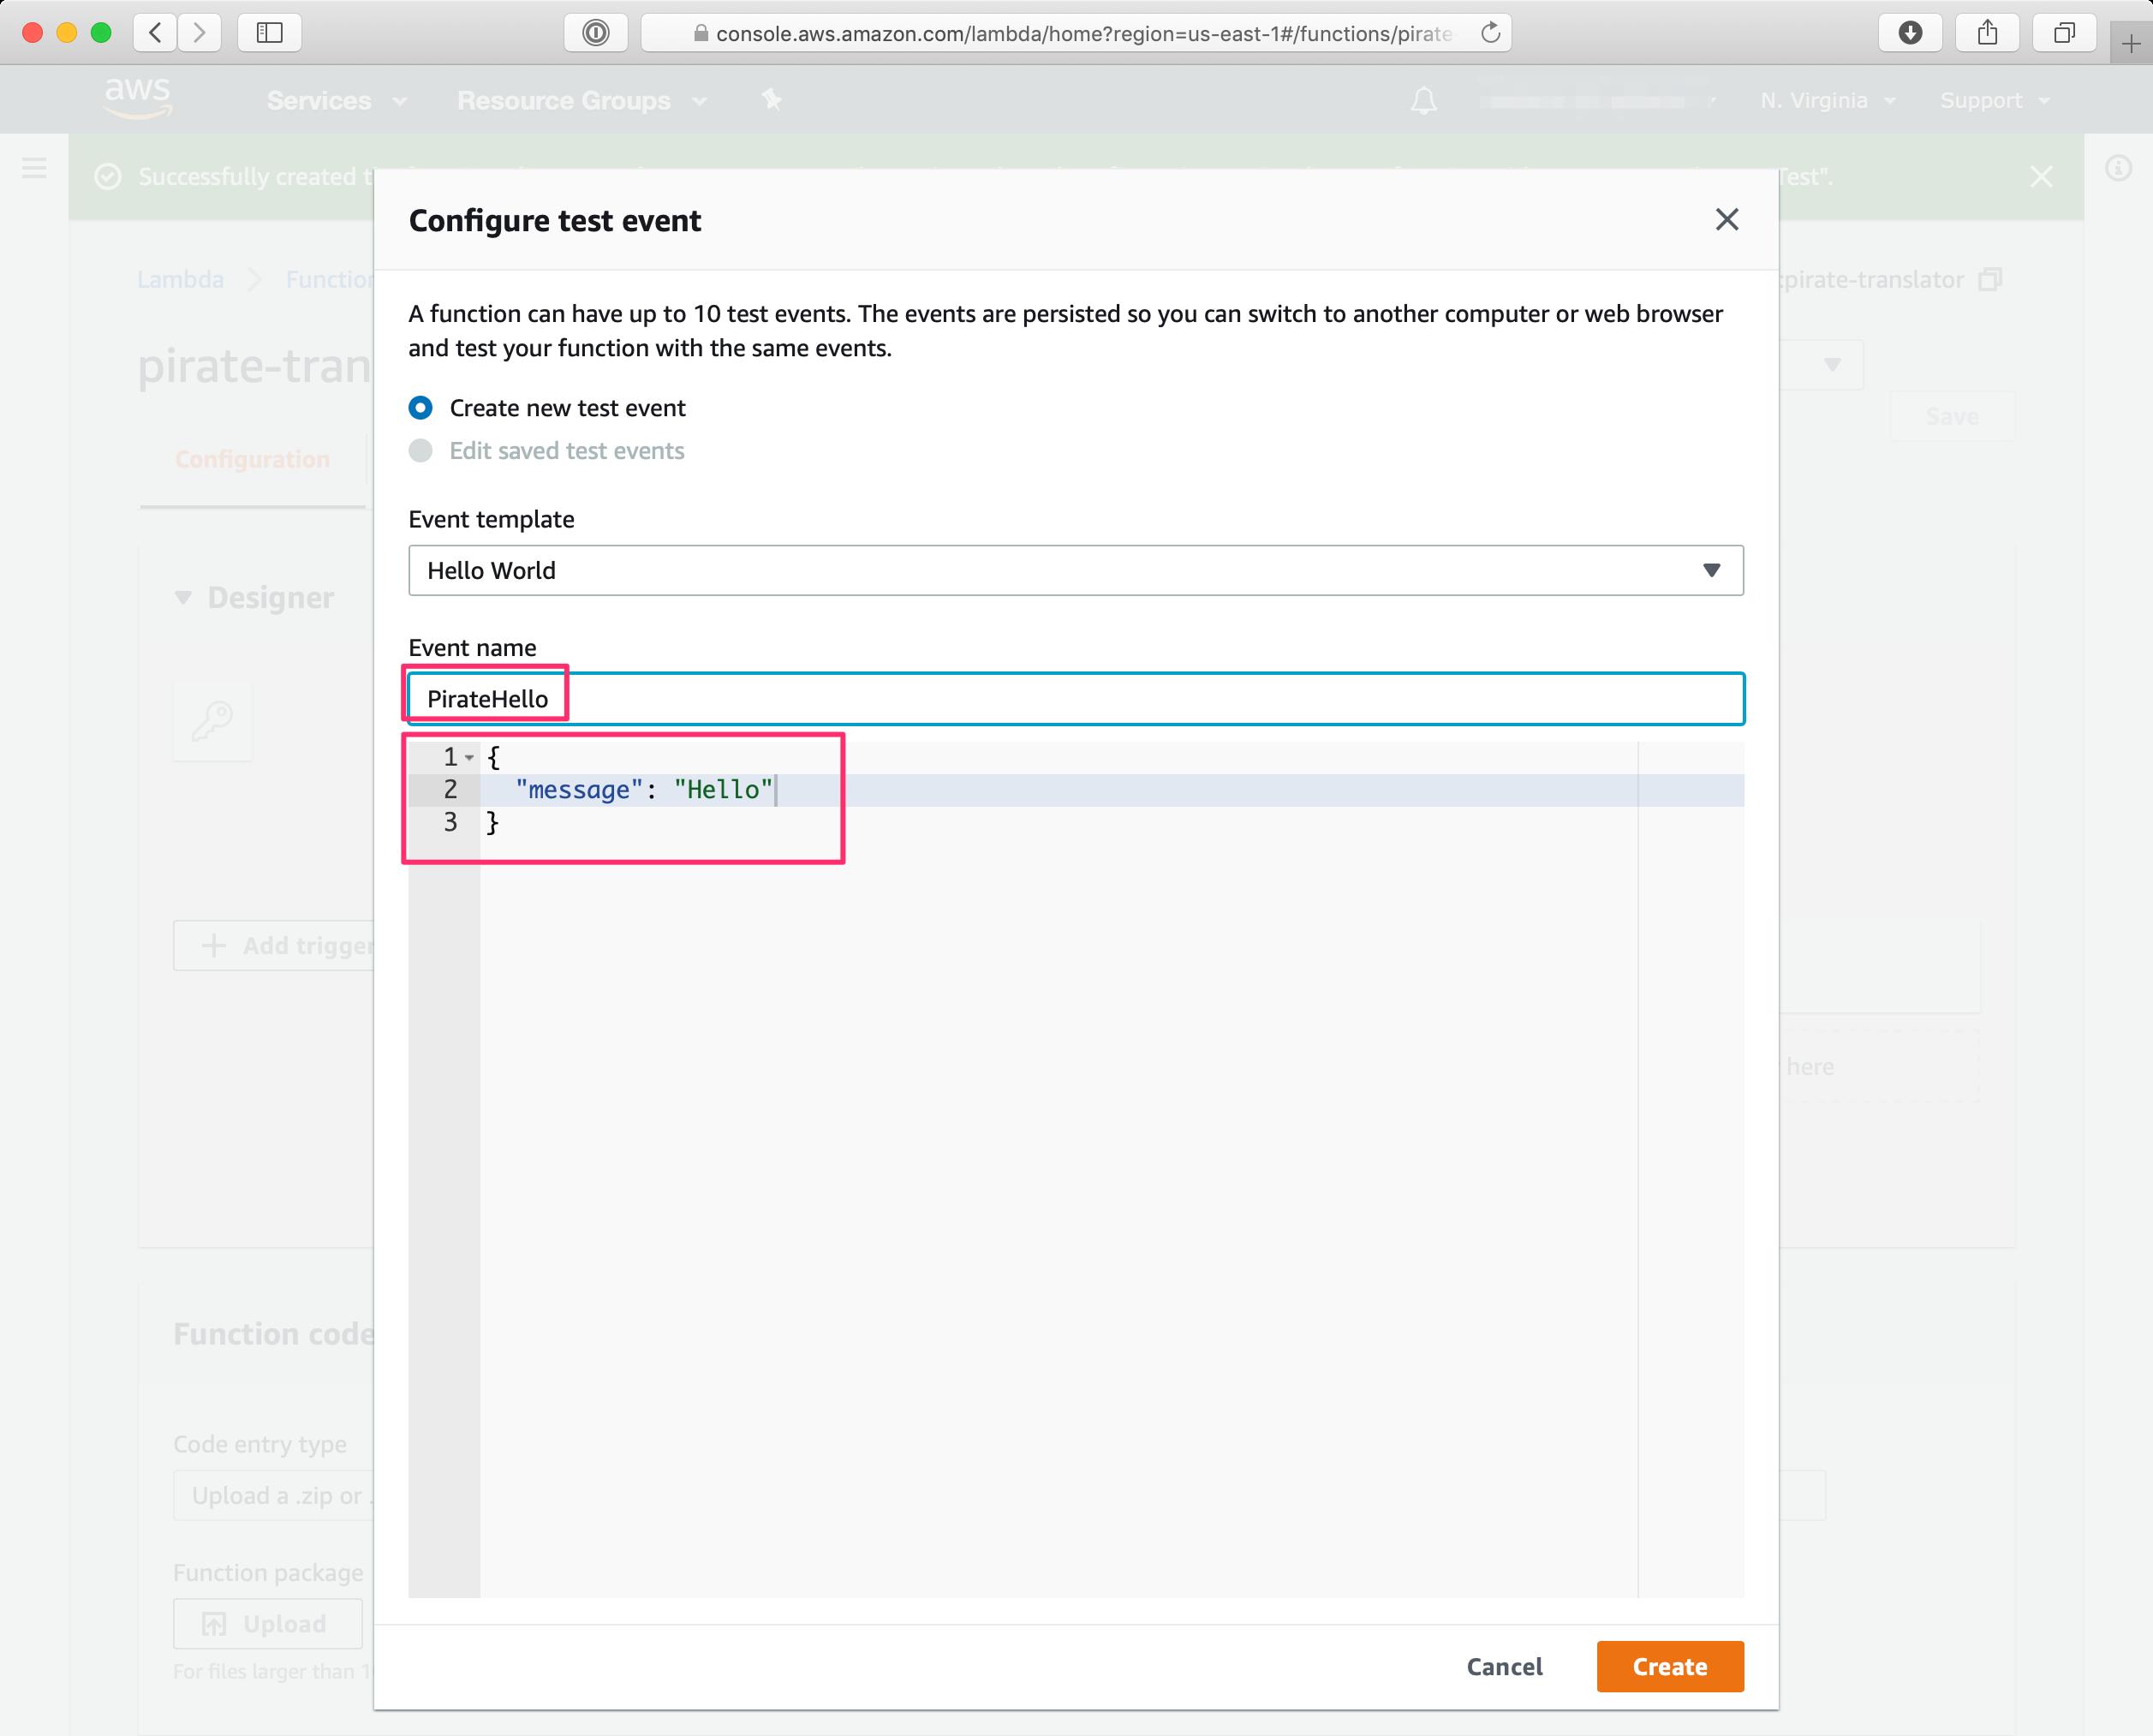 Configure test event dialog